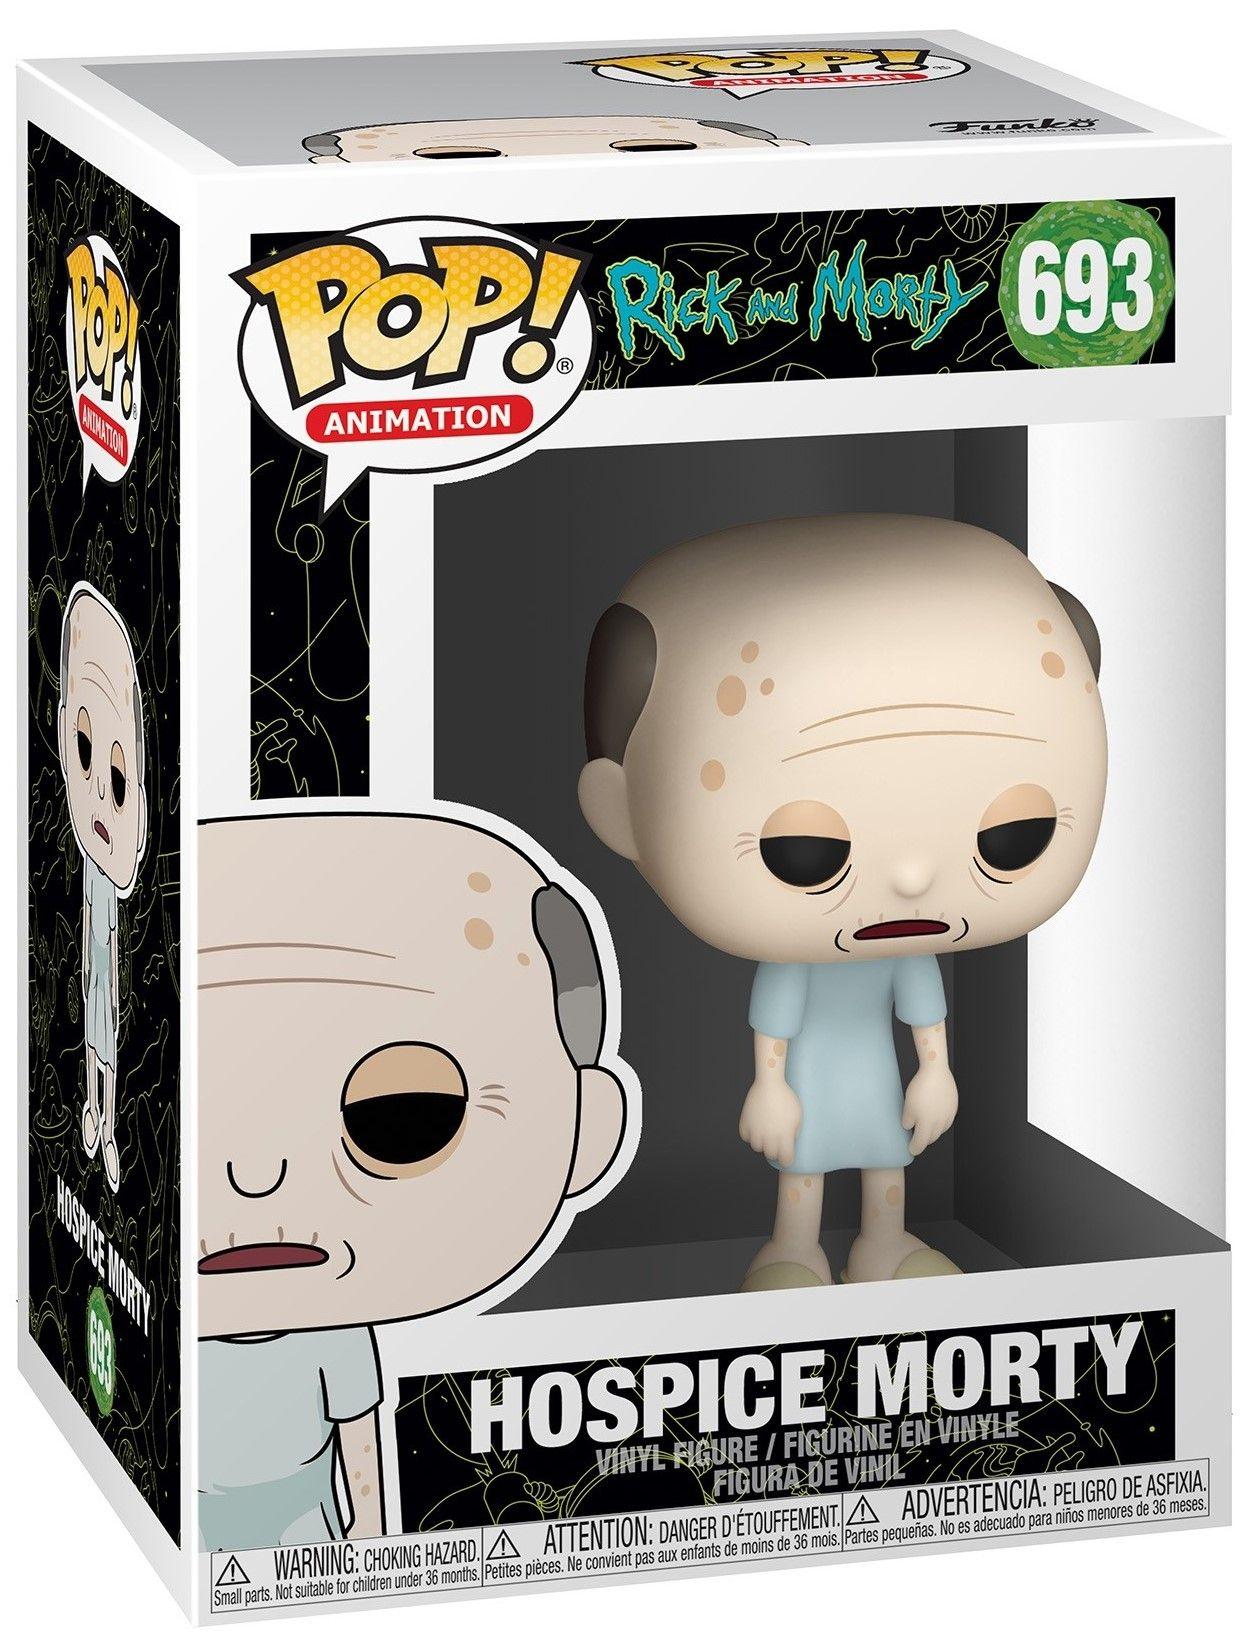 Фигура Funko Pop! Animation: Rick & Morty - Hospice Morty, #693 - 2